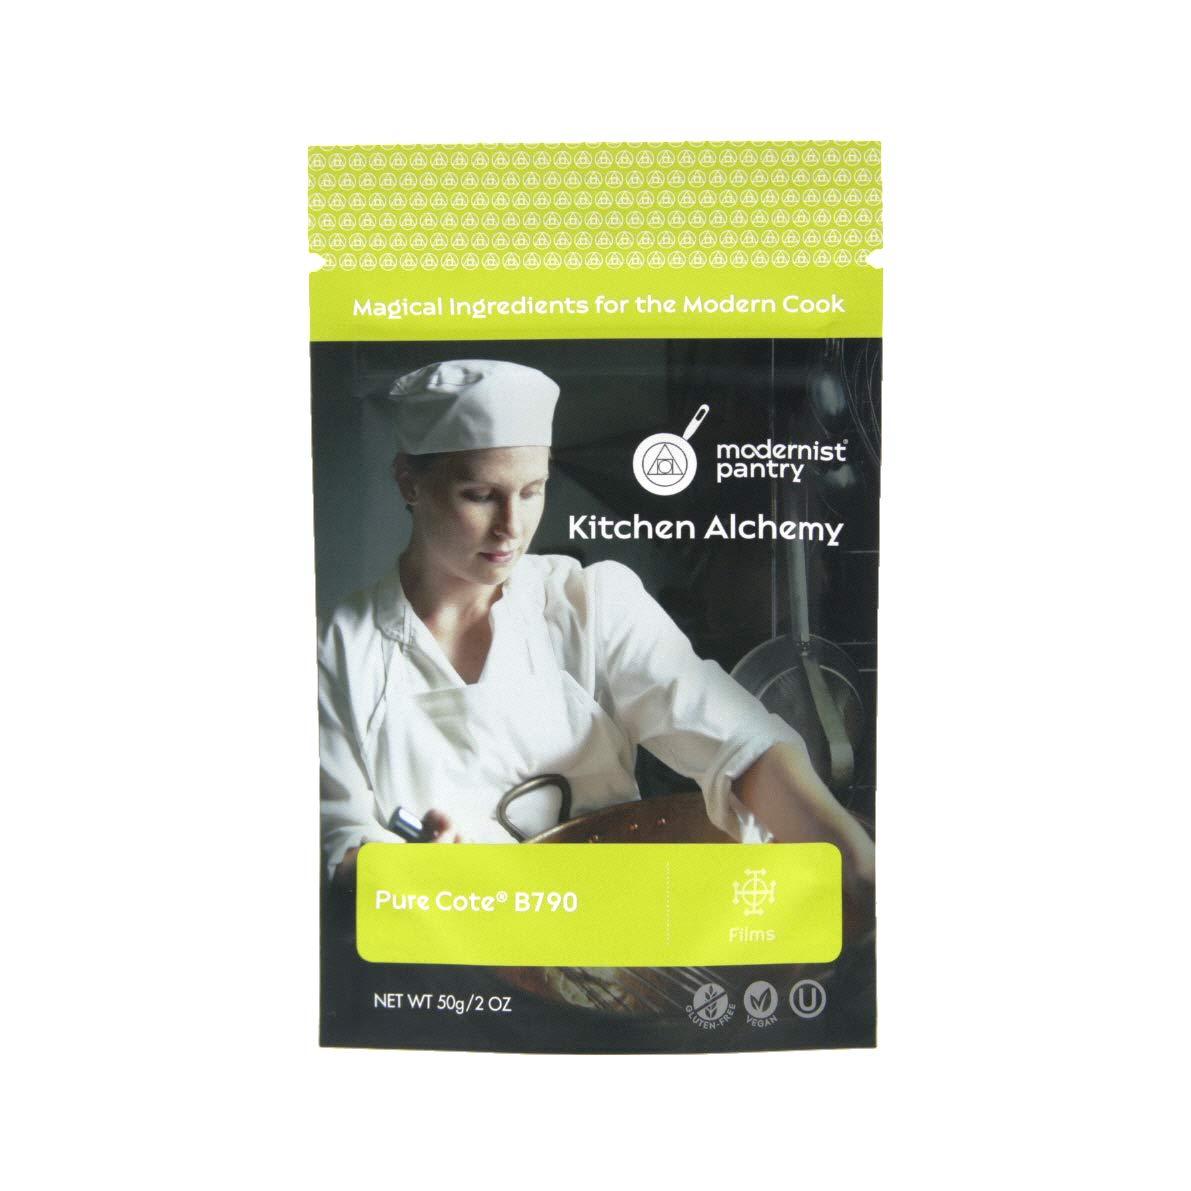 Pure-Cote B790 ⊘ Non-GMO ☮ Vegan ✡ OU Kosher Certified - 50g/2oz